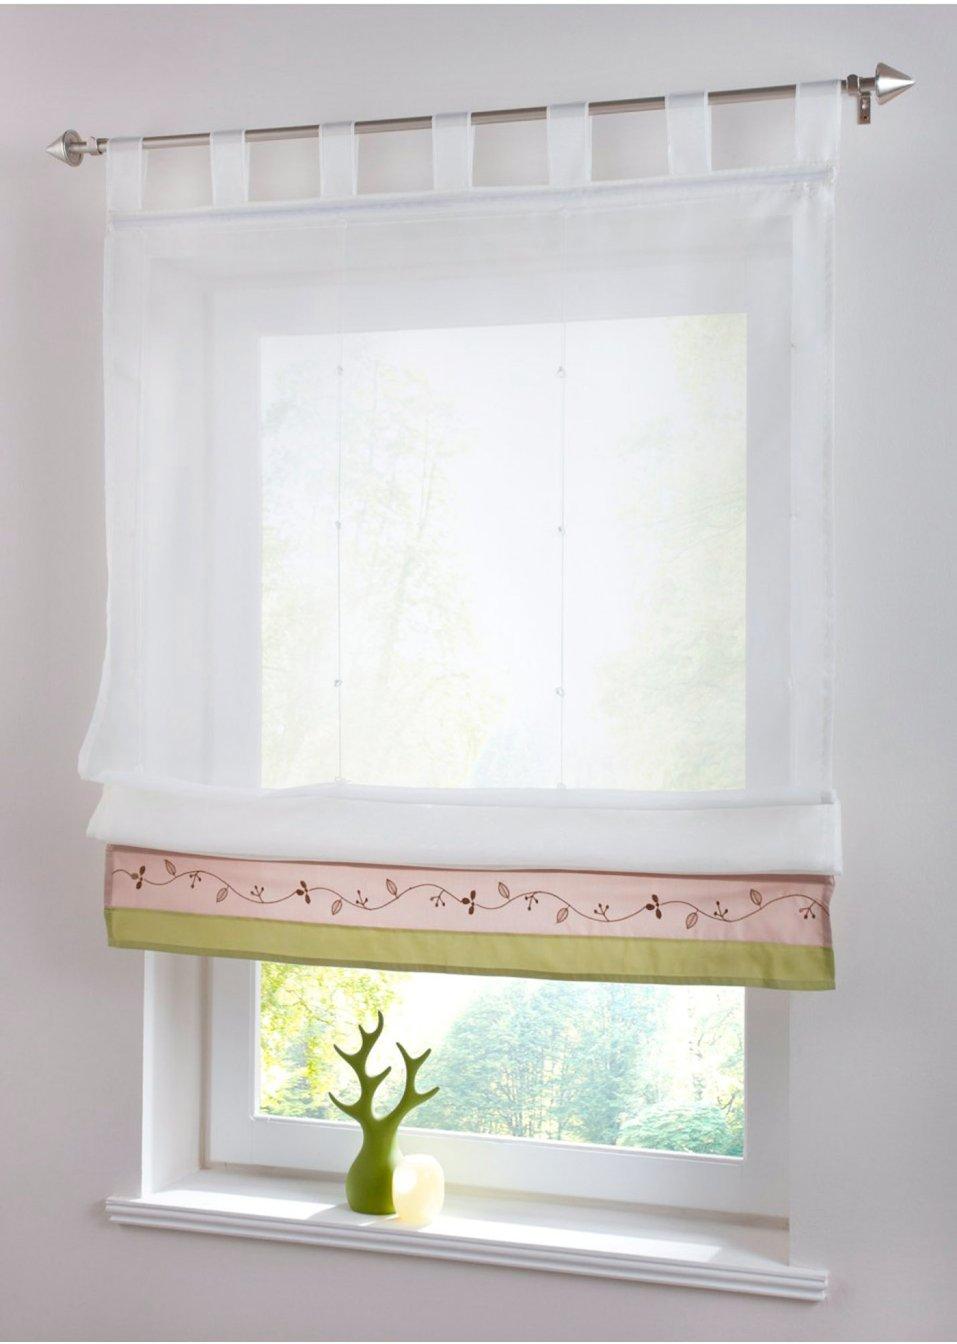 Roller Blinds In Kitchen Aliexpresscom Buy European Short Sheer Curtains For Living Room